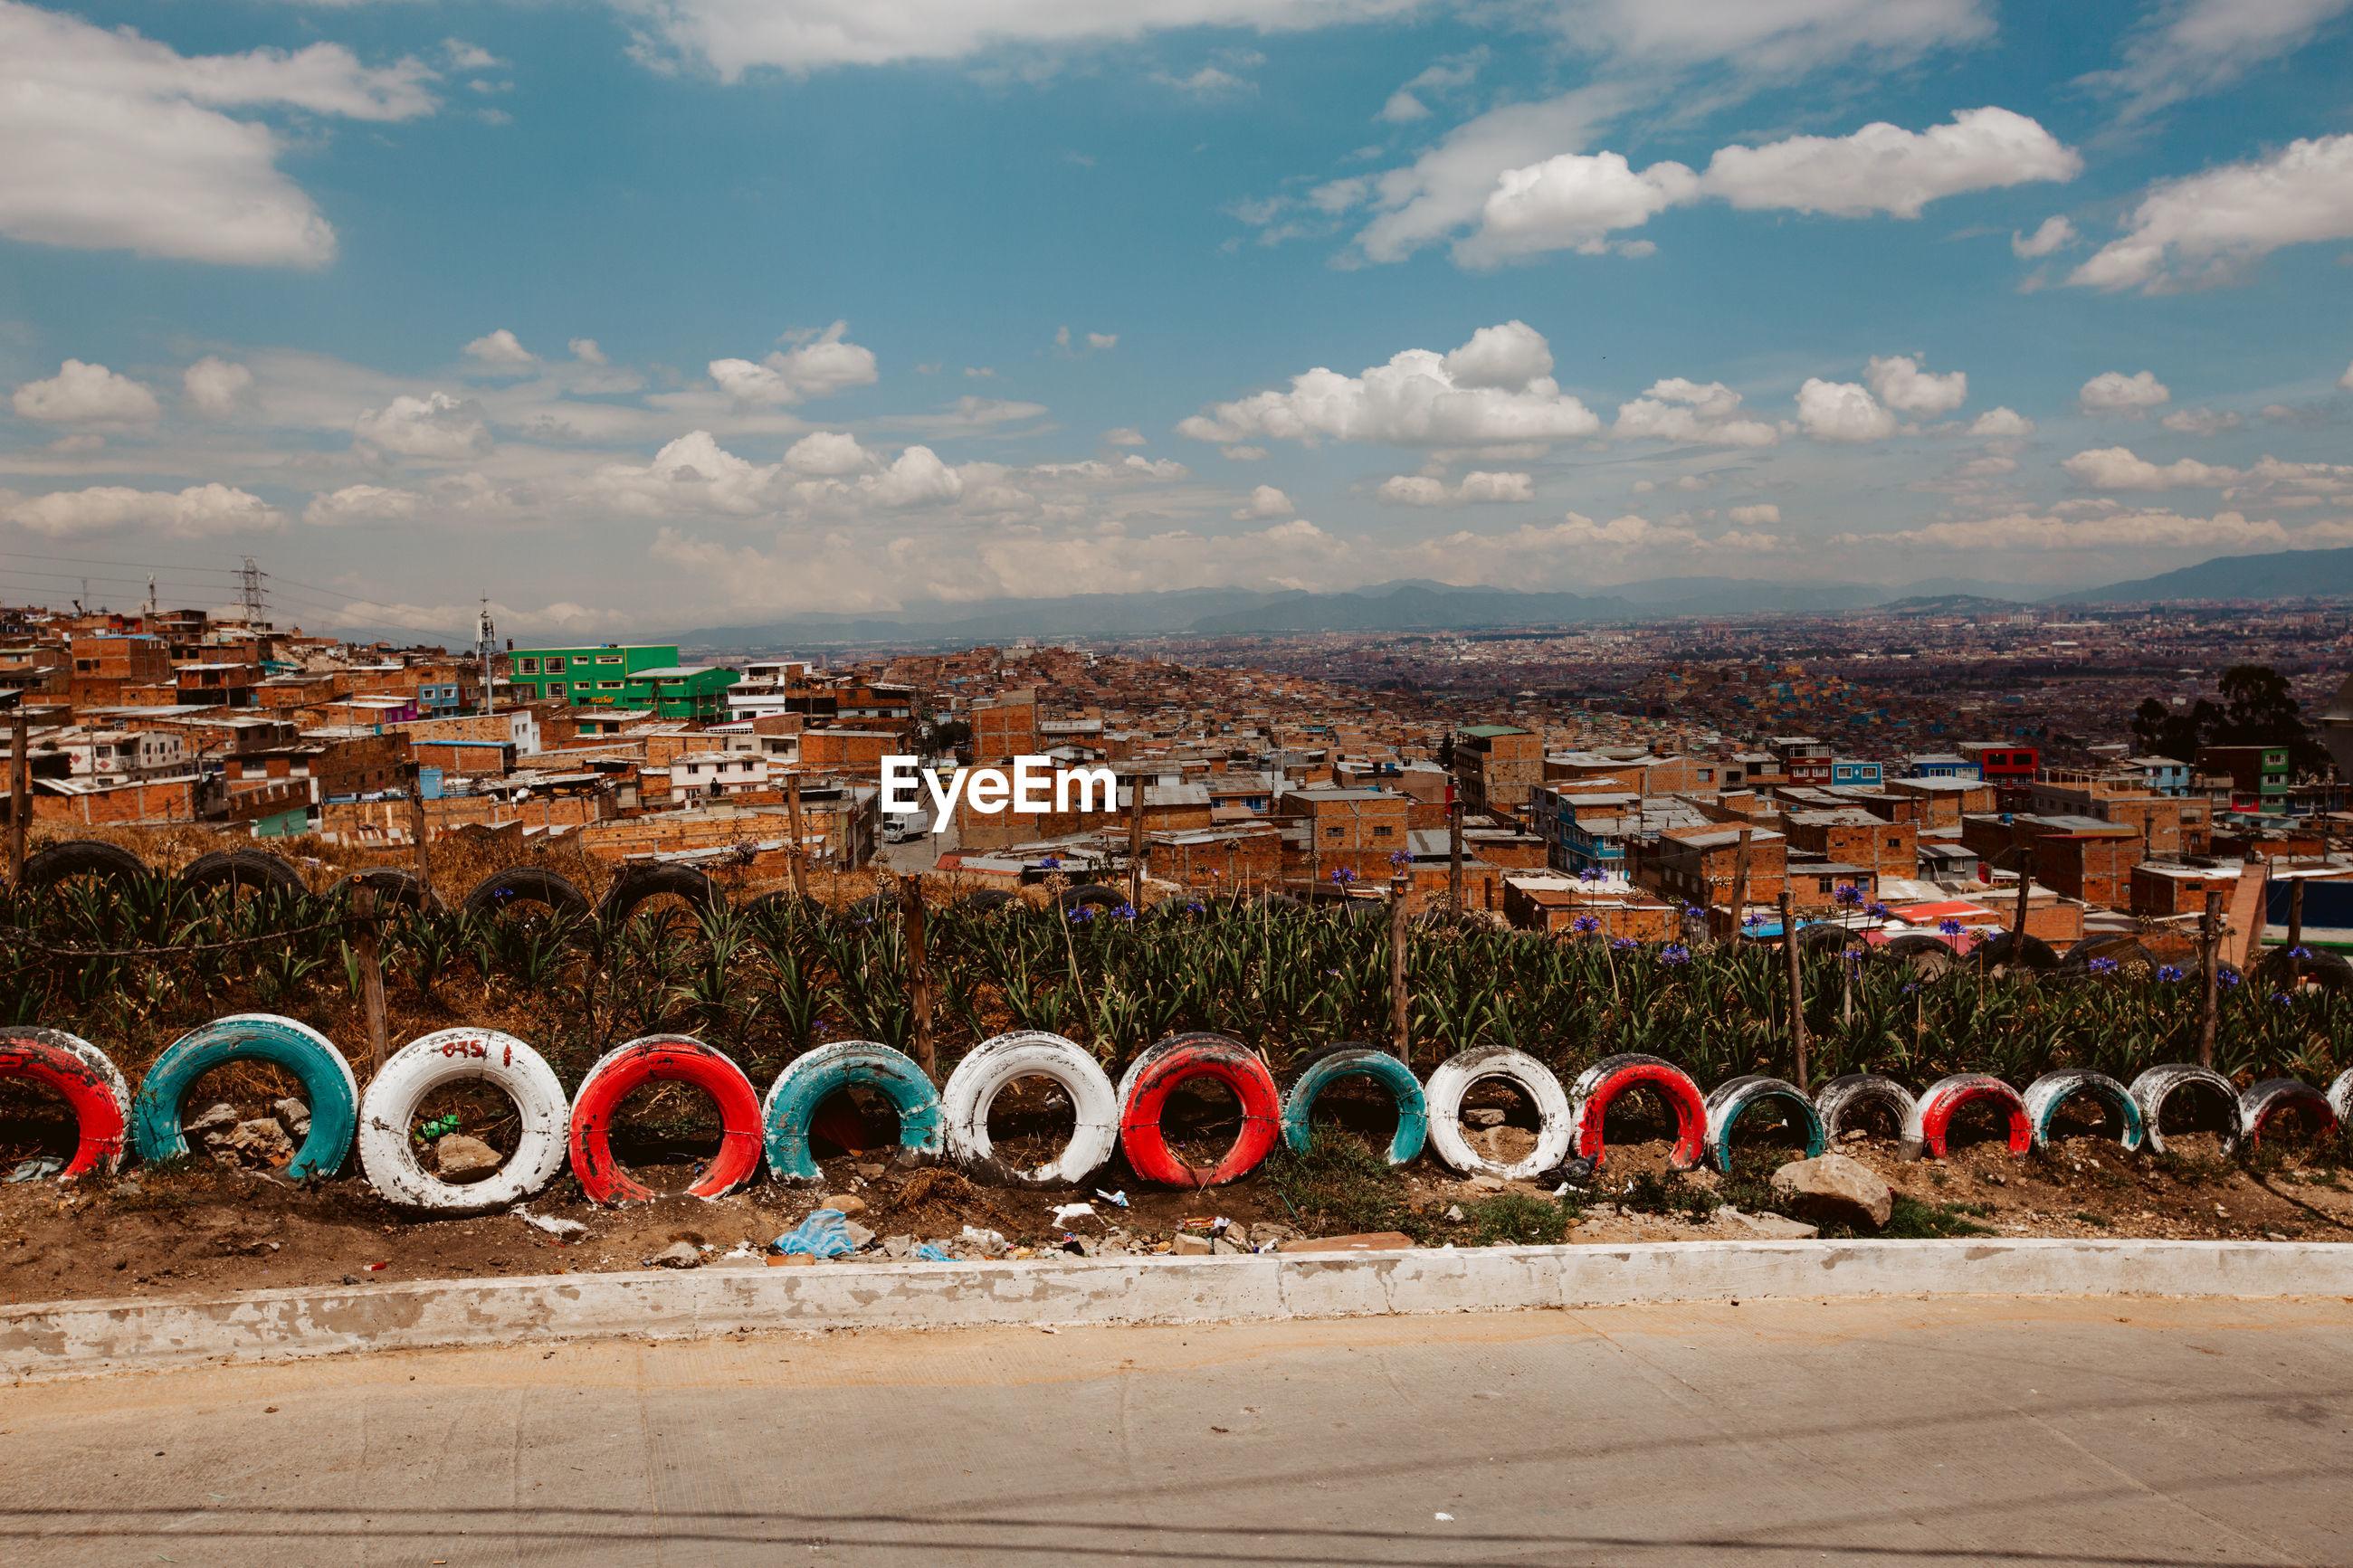 Panoramic shot of townscape against sky ciudad bolivar